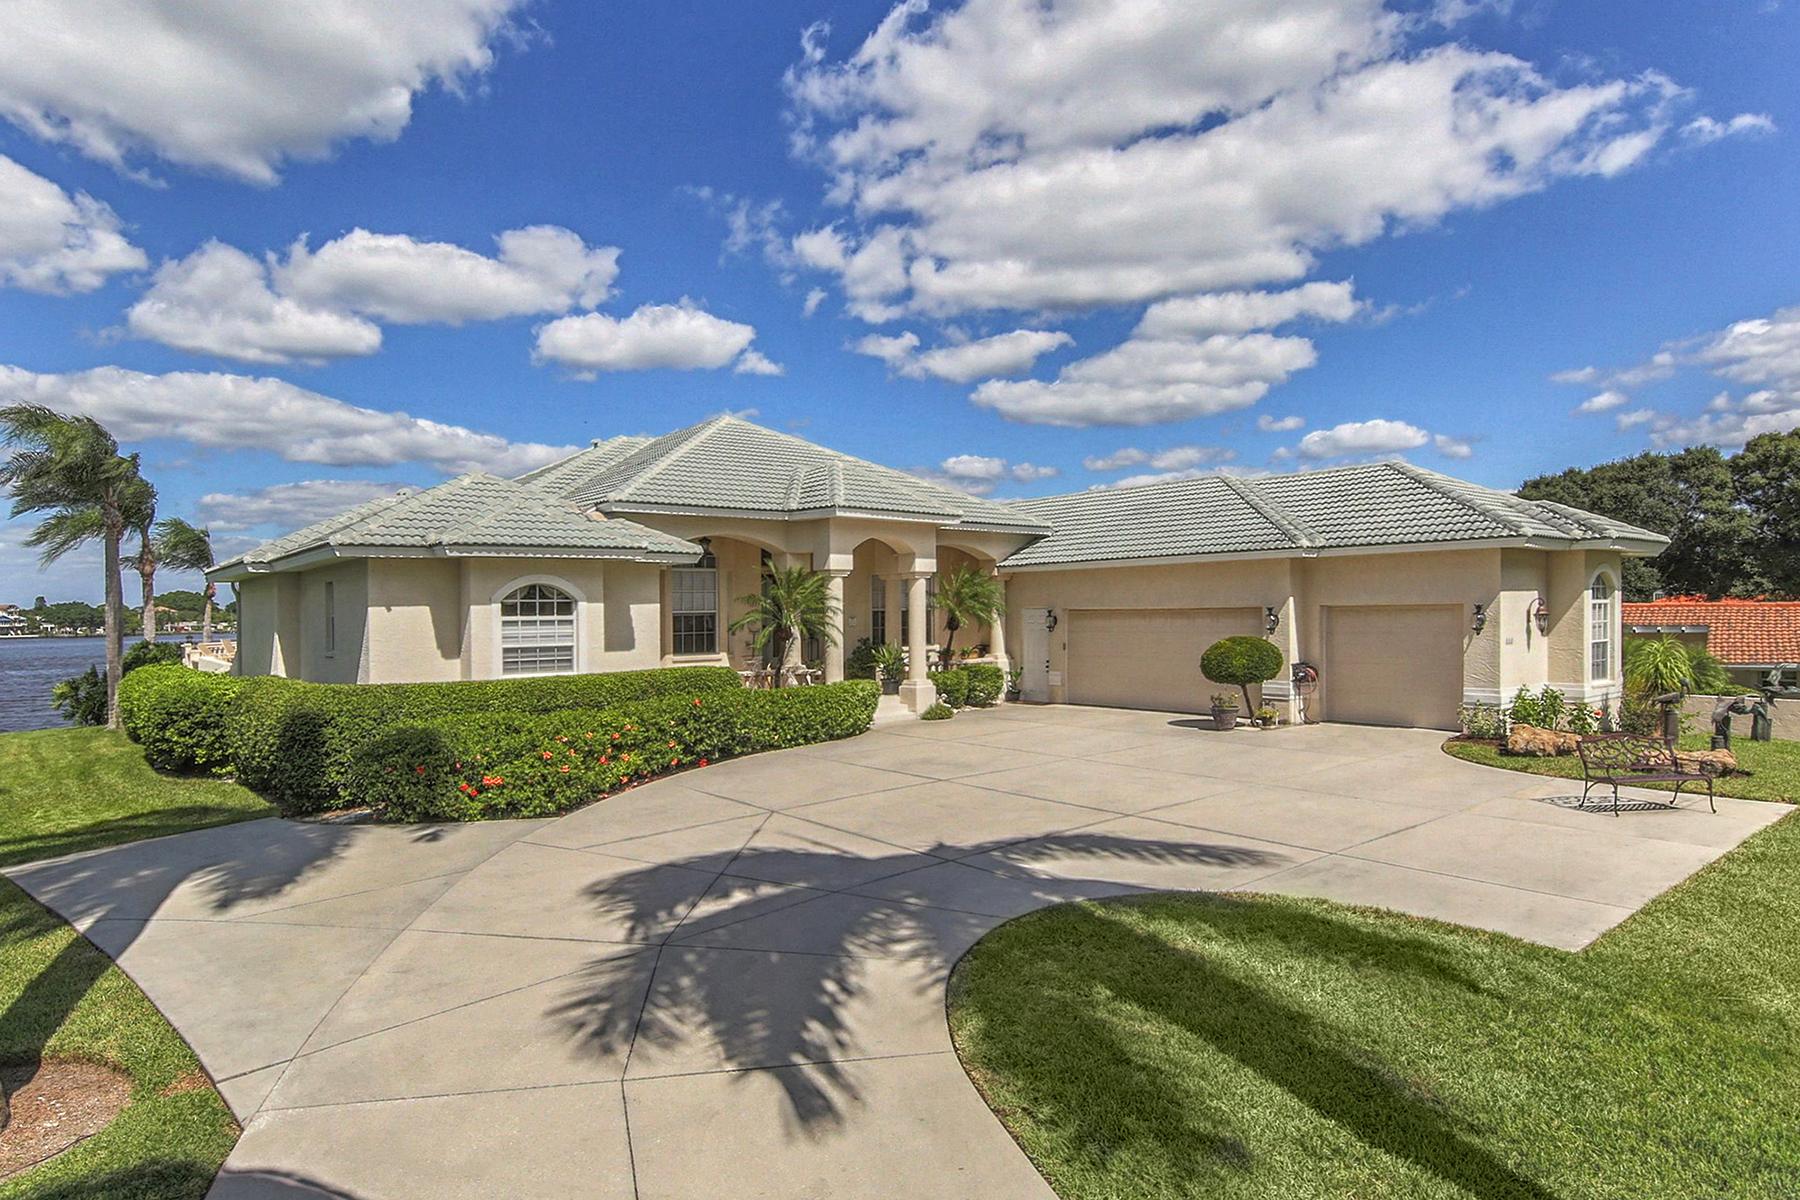 Single Family Home for Sale at VENICE ISLAND 444 Bayshore Dr, Venice, Florida 34285 United States